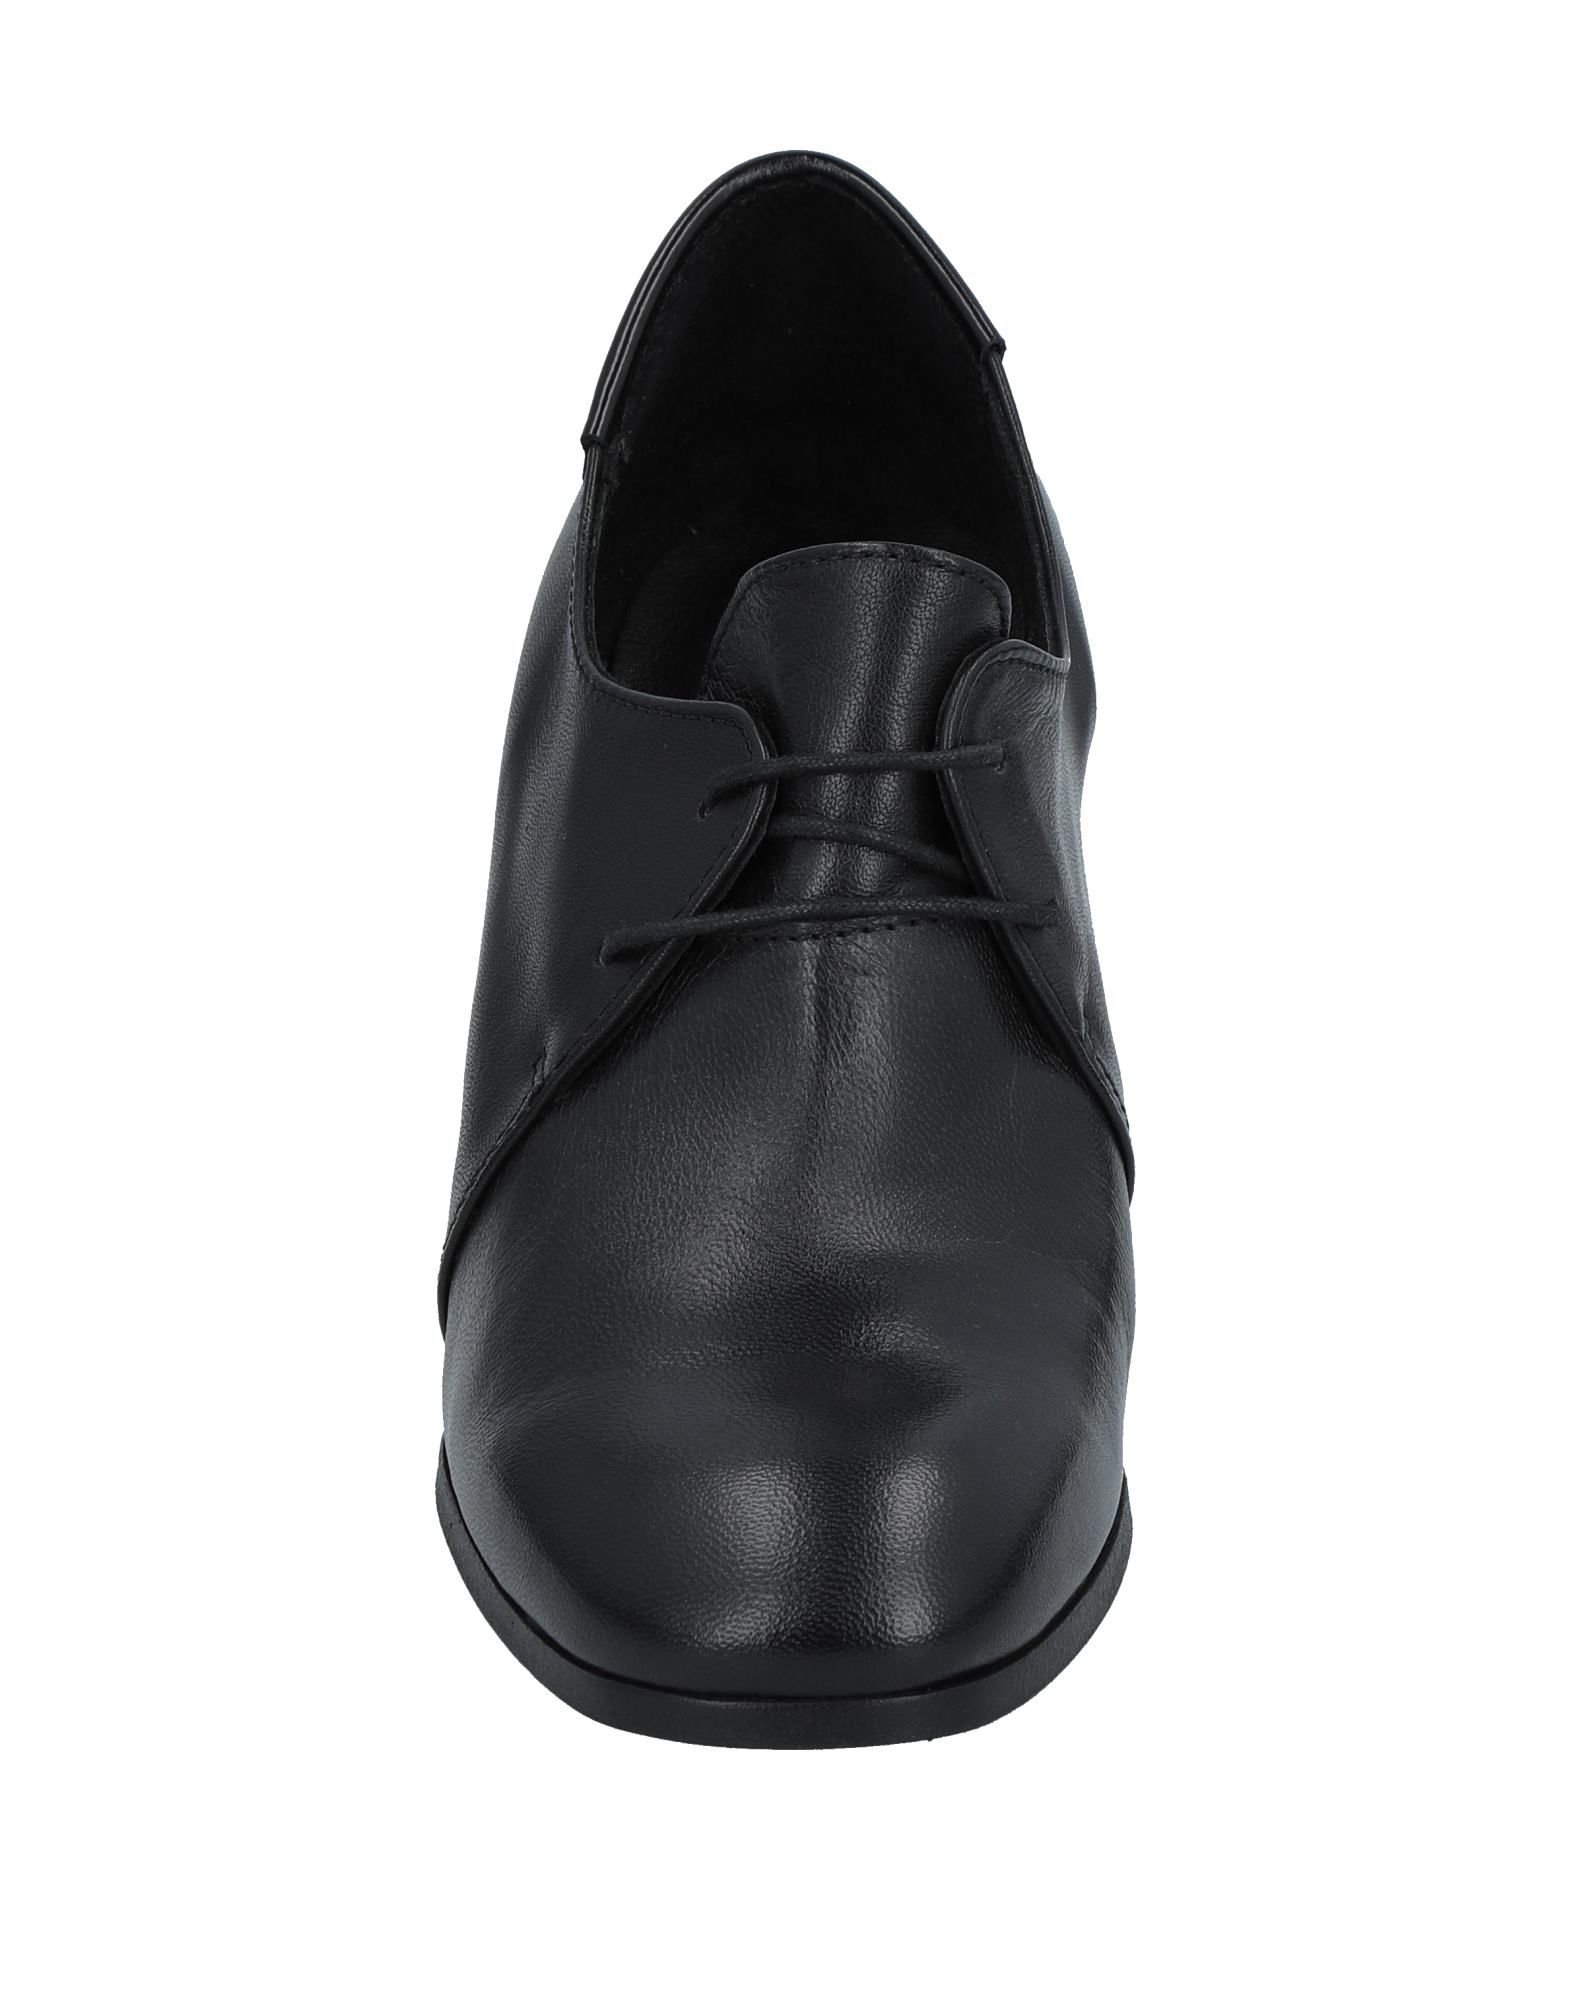 Lilimill Schnürschuhe Damen  11523963WW Gute Qualität beliebte Schuhe